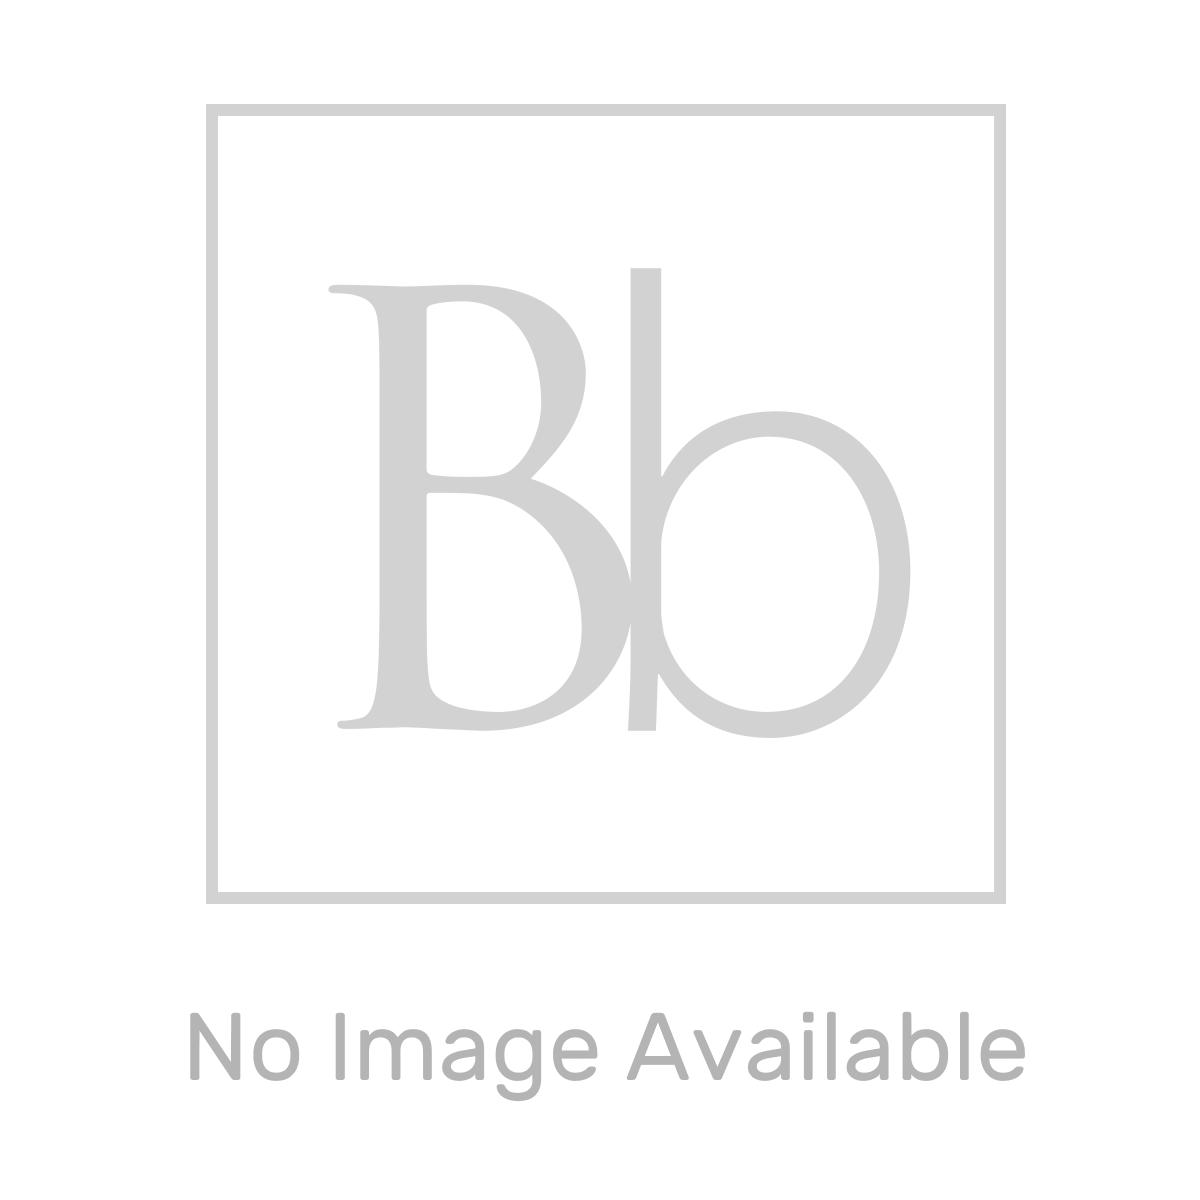 HiB Axis Landscape LED Back-Lit Bathroom Mirror